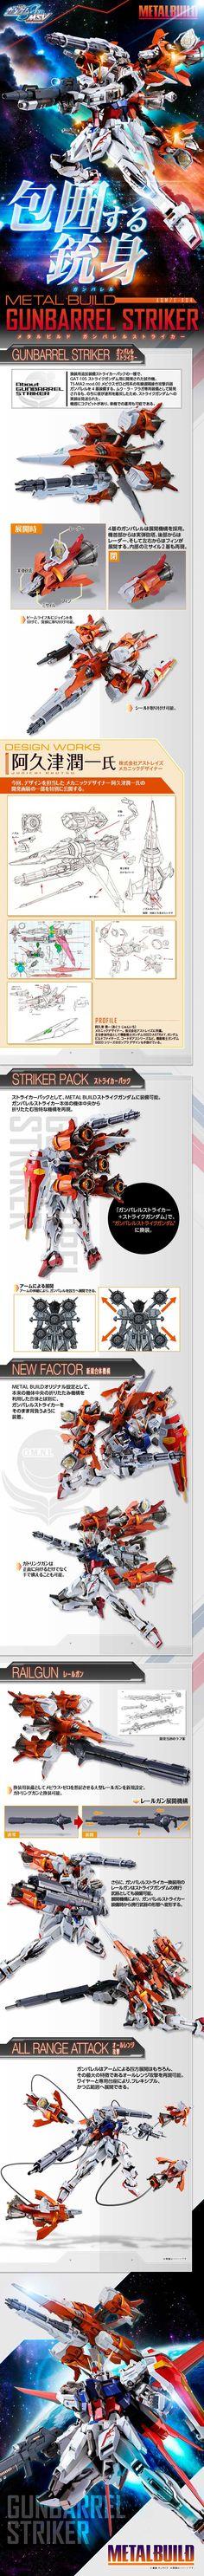 ●● 9/8/2018 玩具新聞報導 ●● - 日系英雄/機械人 - Toysdaily 玩具日報 - Powered by Discuz! Strike Gundam, Gundam Seed, Msv, Real Style, Mobile Suit, Resin Art, Diorama, Sci Fi, Fantasy